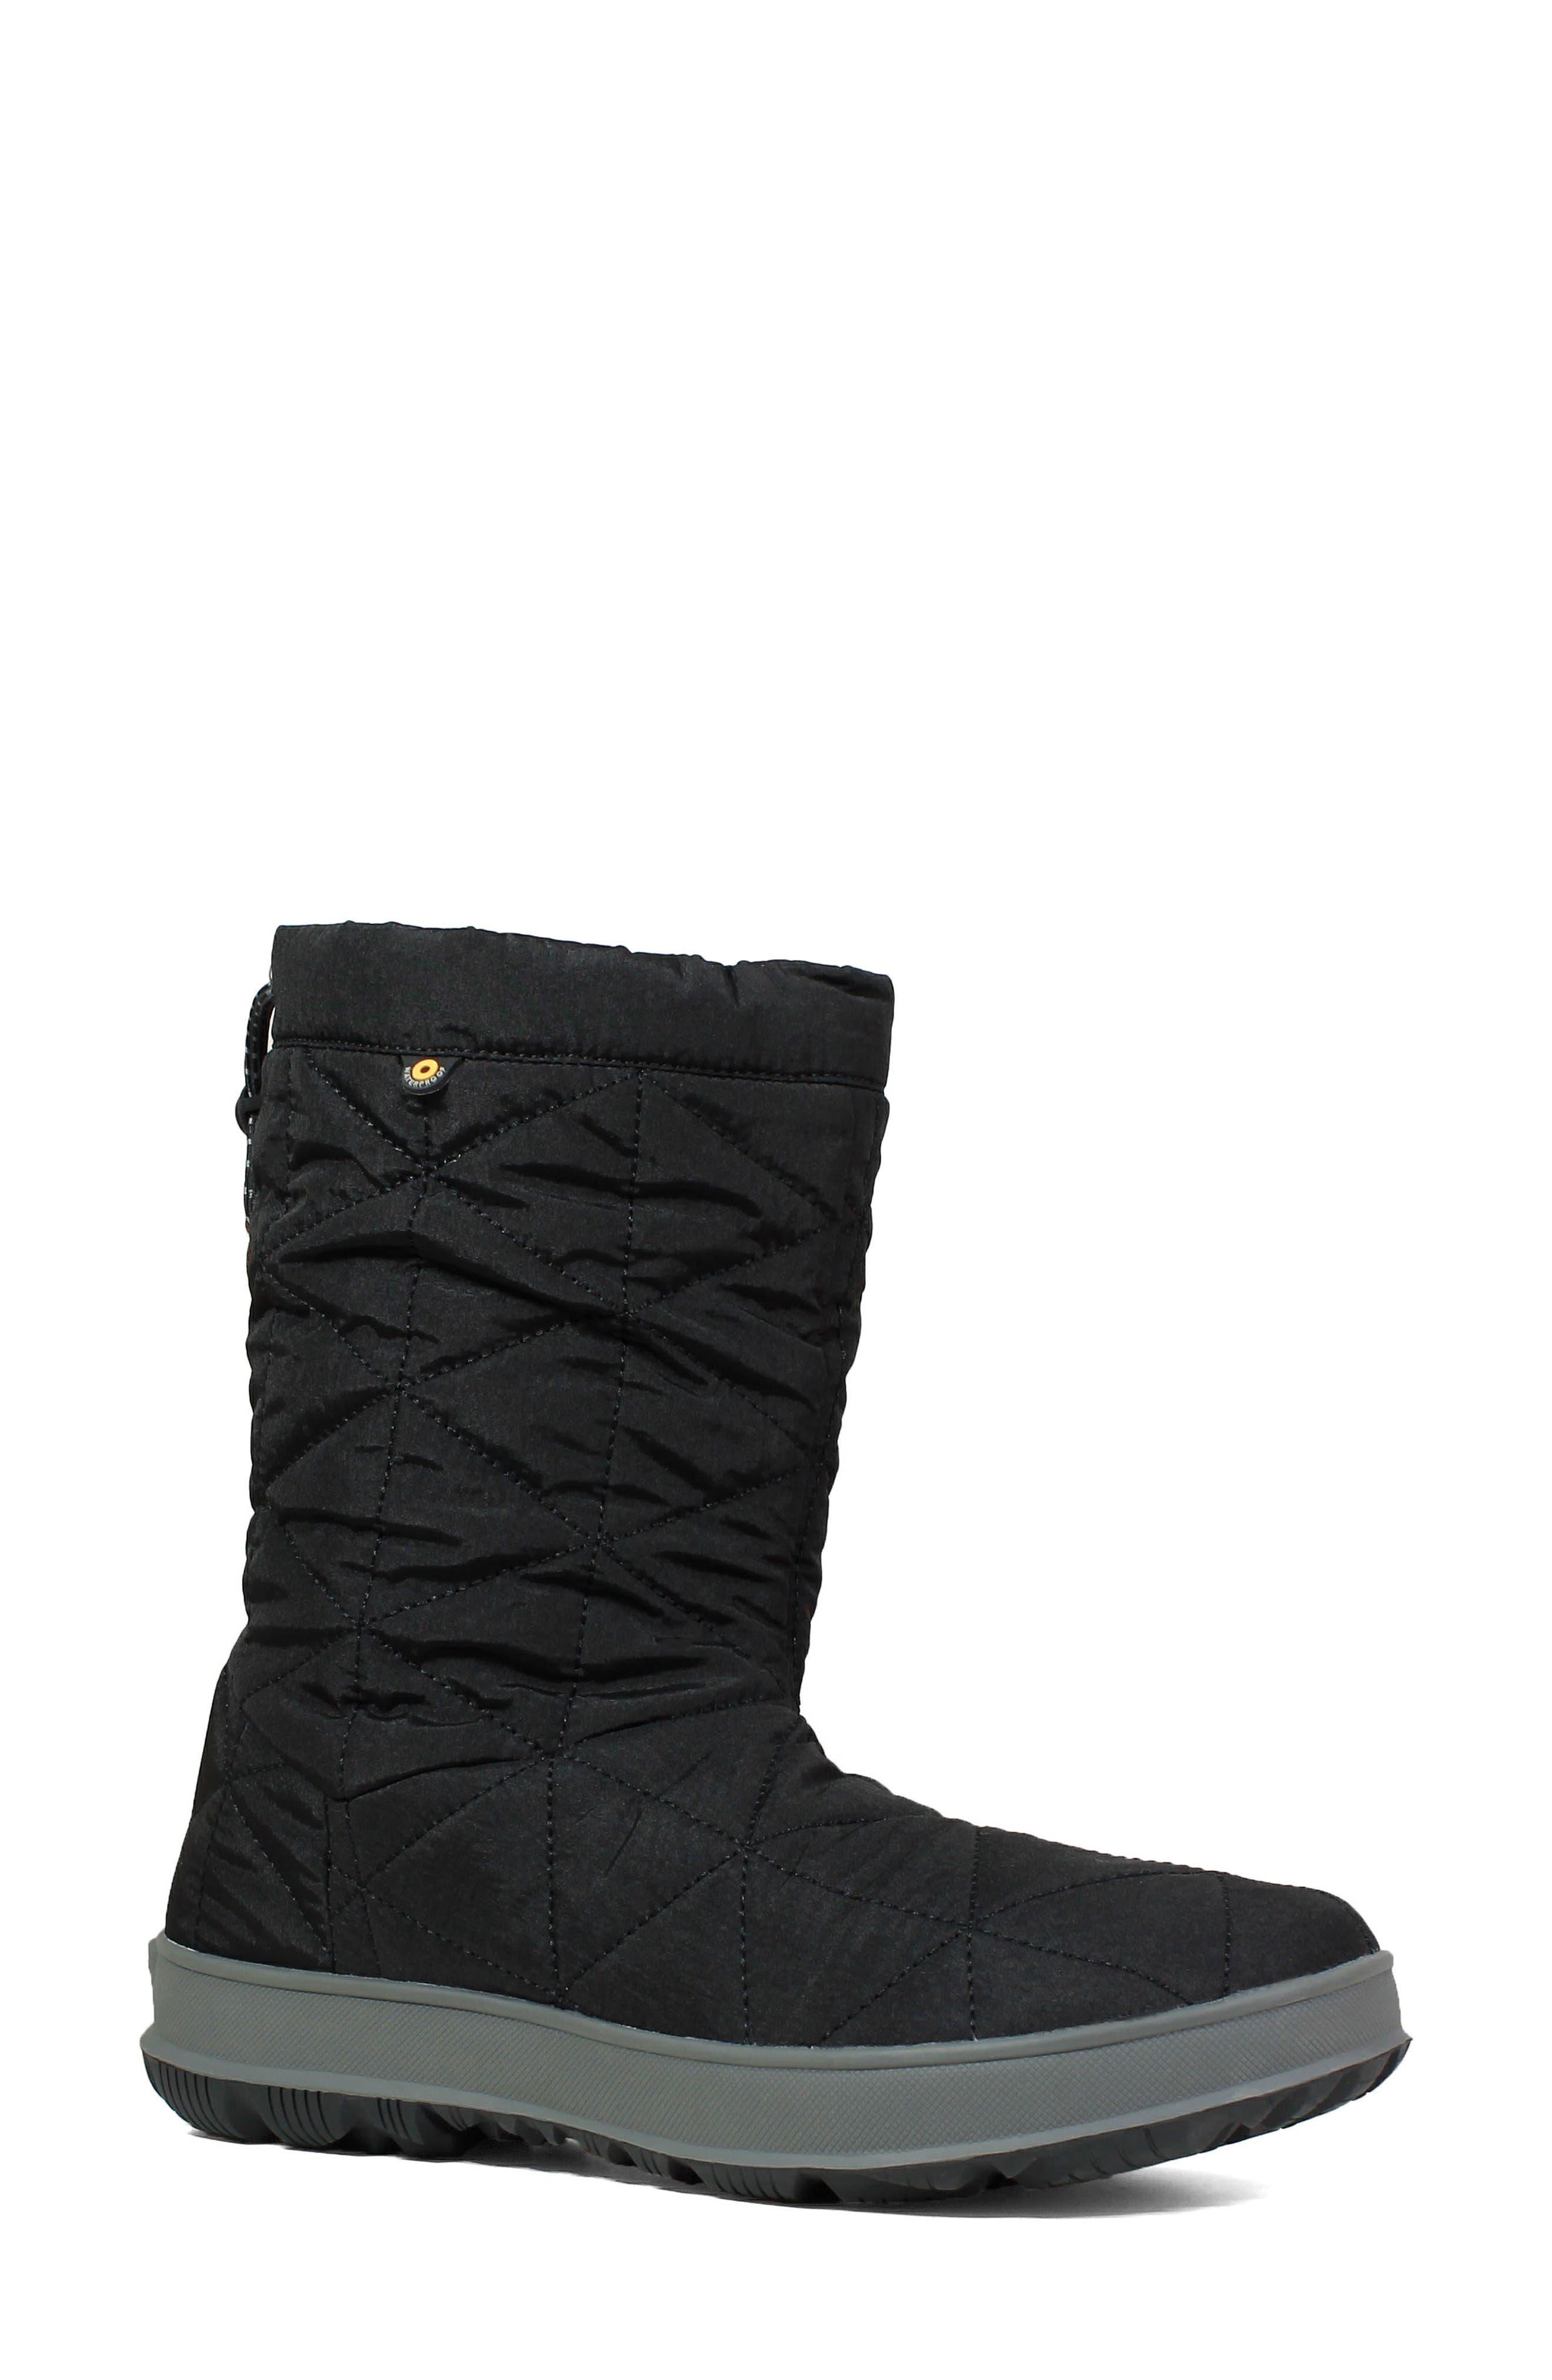 BOGS, Mid Snowday Waterproof Bootie, Main thumbnail 1, color, BLACK